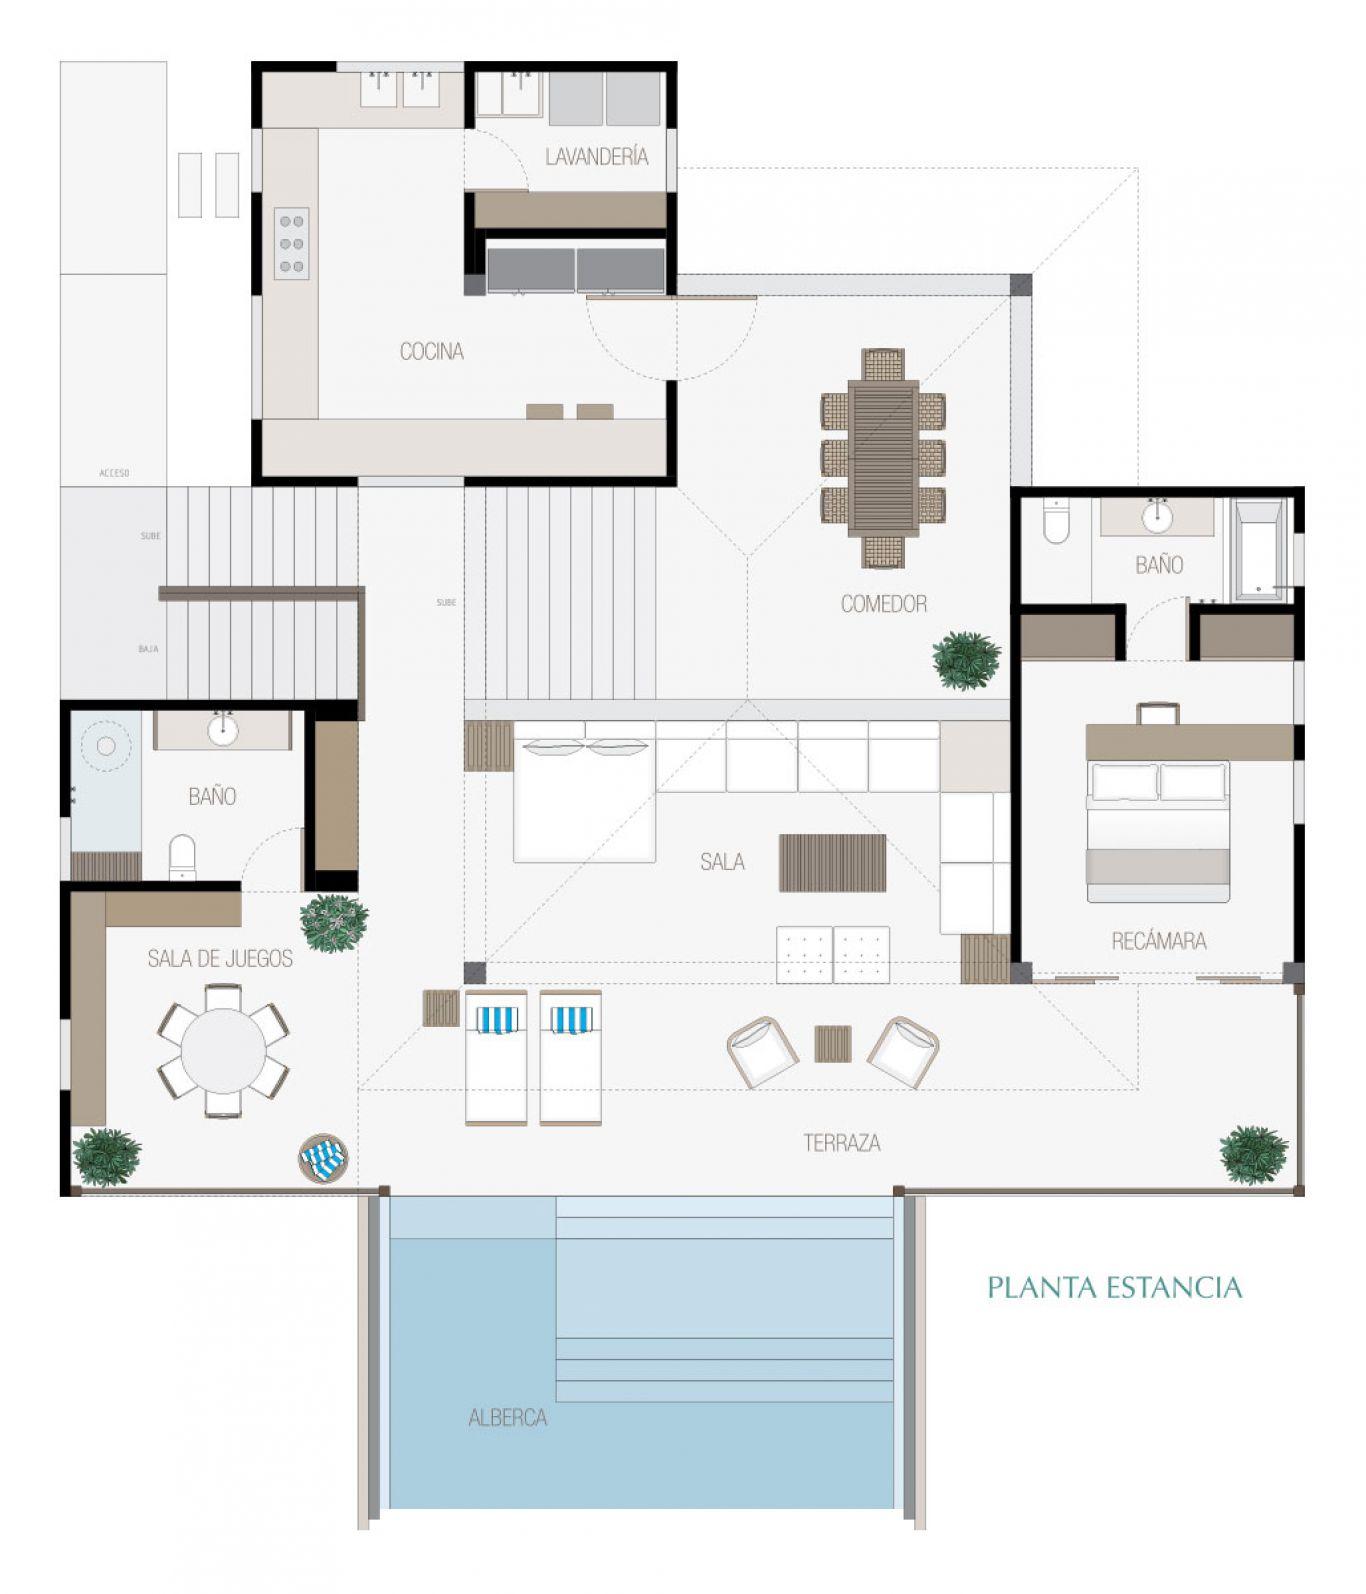 Manai, id 1519068, no 2, plano de villa 8, 288